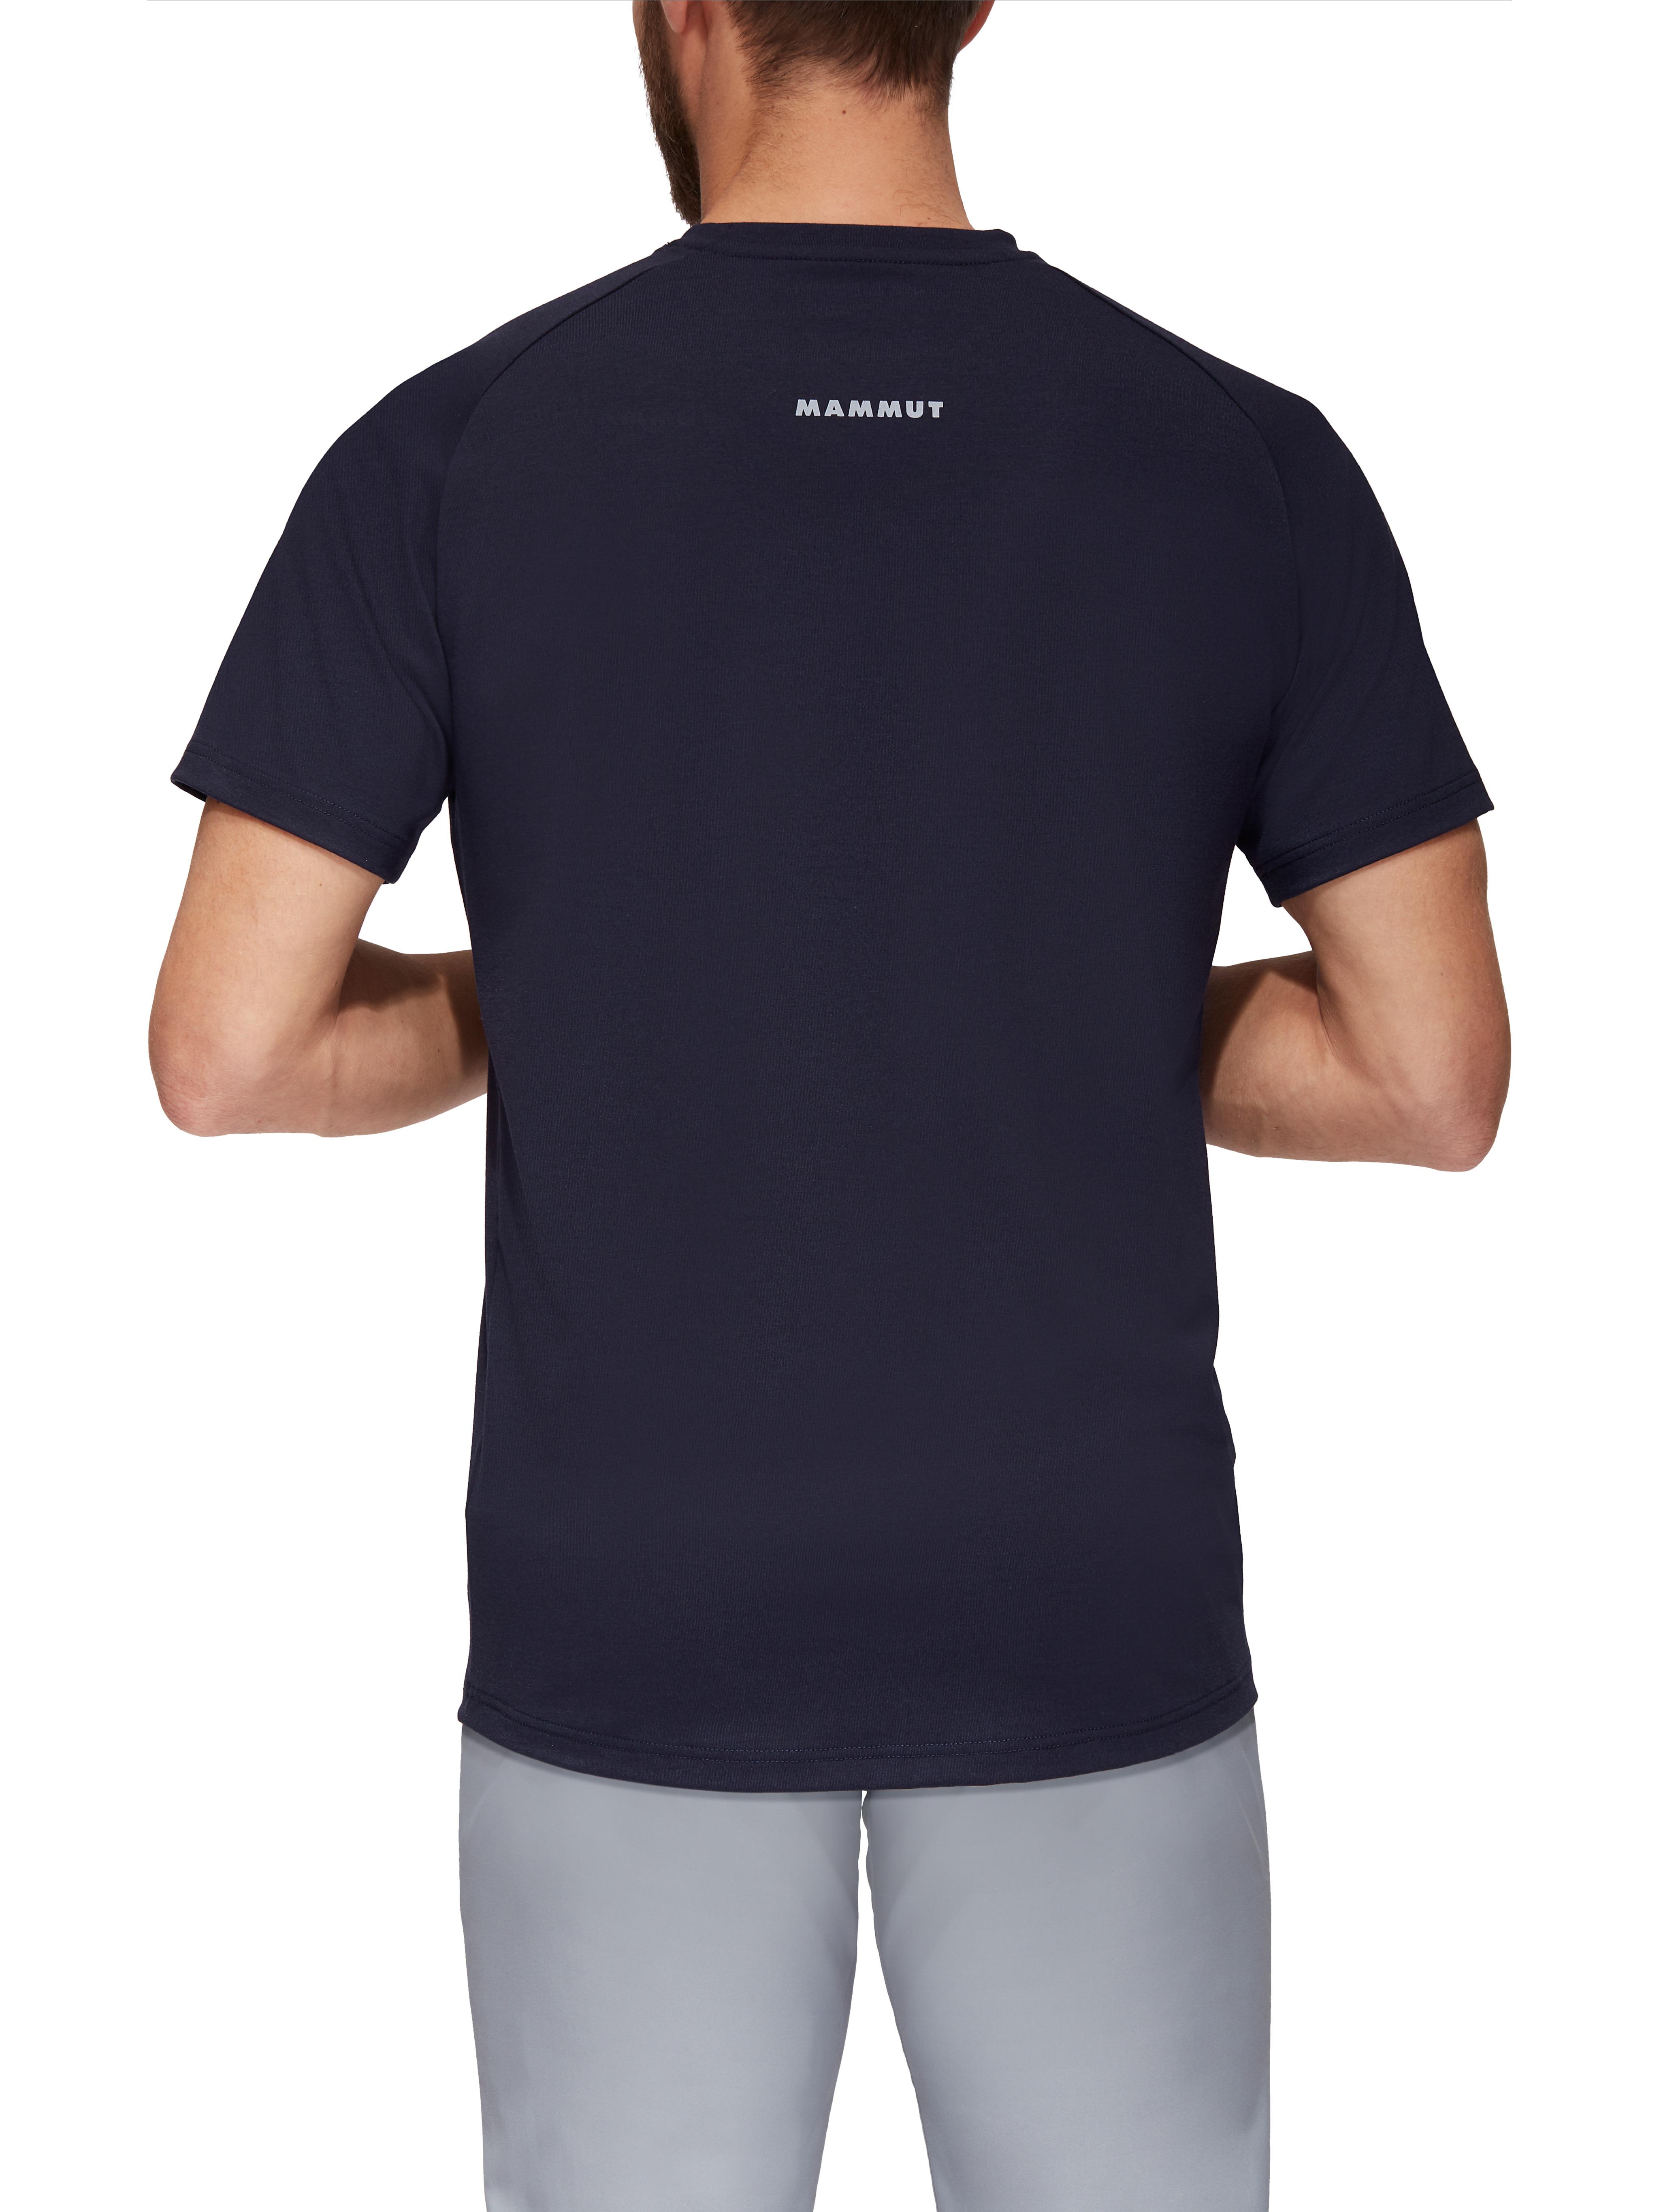 Mountain T-Shirt Men thumbnail